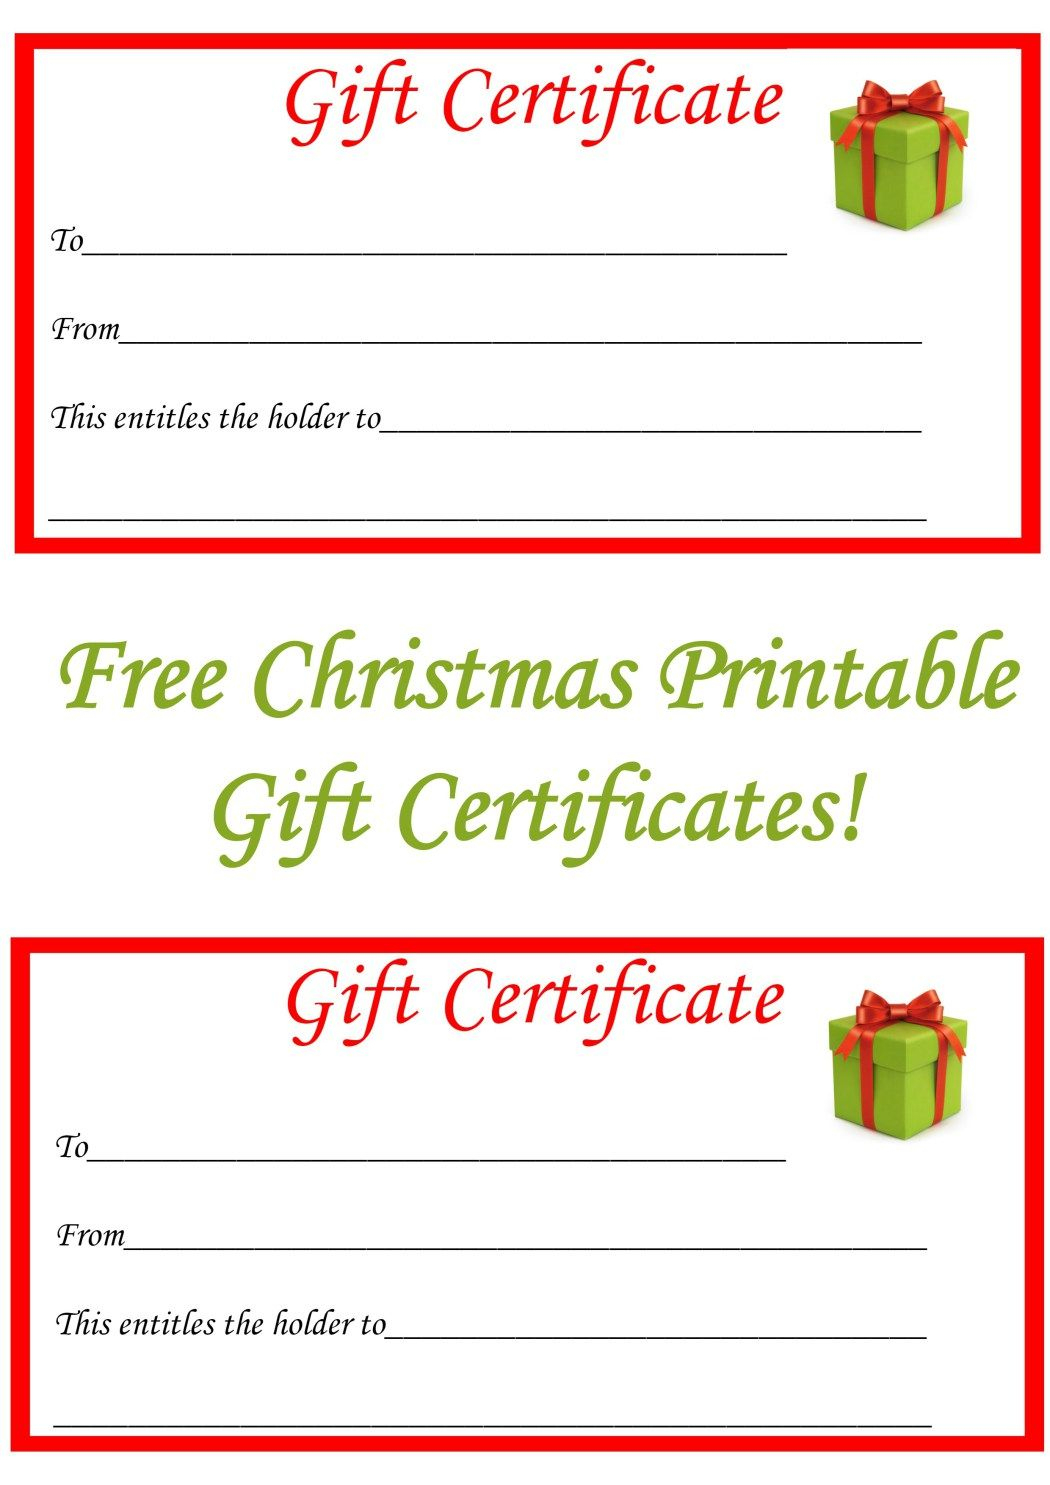 Free Christmas Printable Gift Certificates | Gift Ideas | Pinterest - Free Printable Christmas Gift Cards